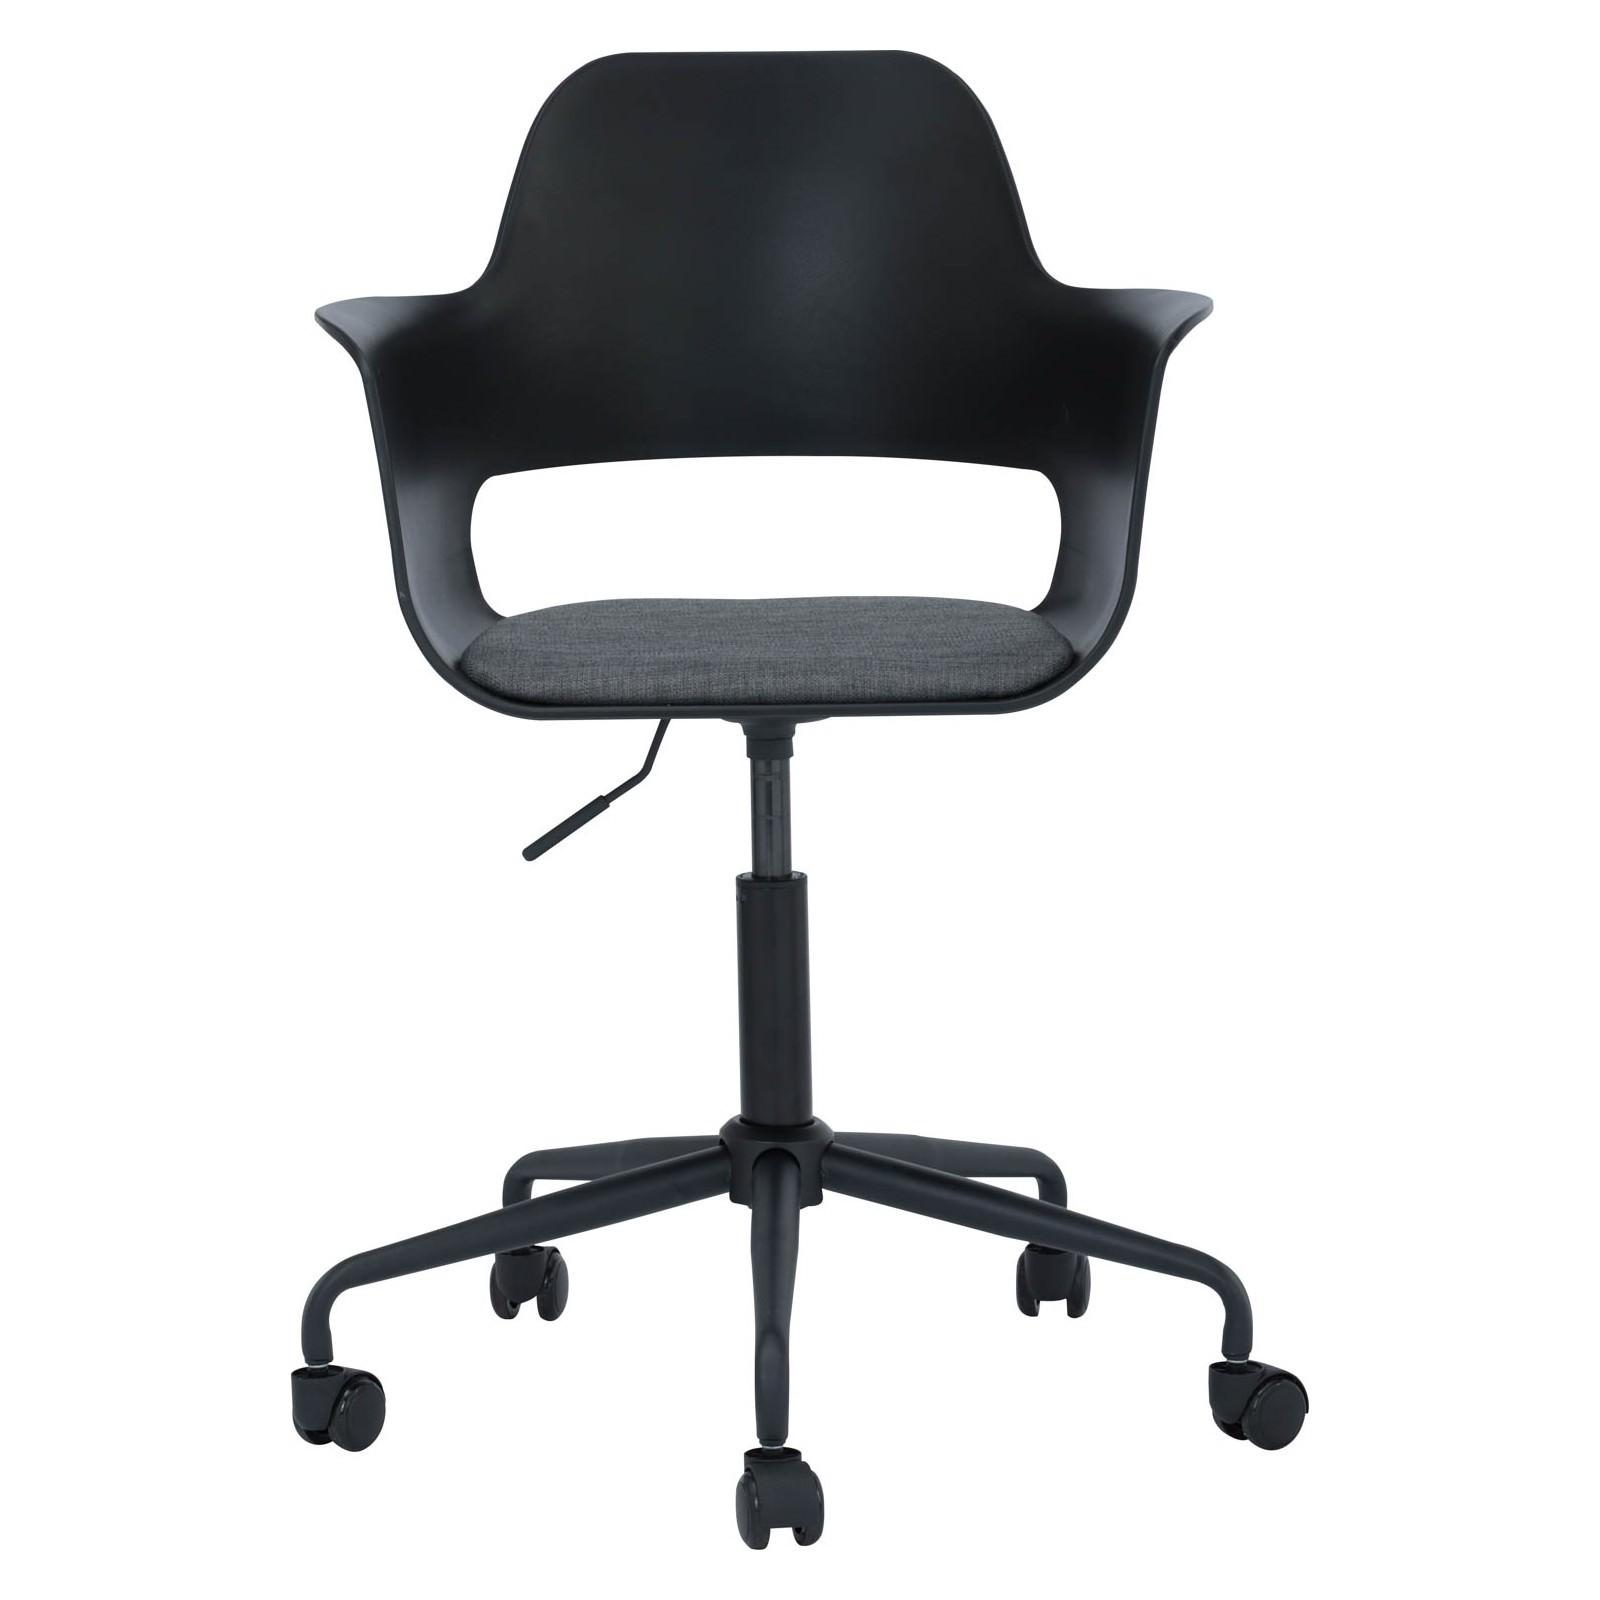 Laxmi Commercial Grade Swivel Office Chair, Black